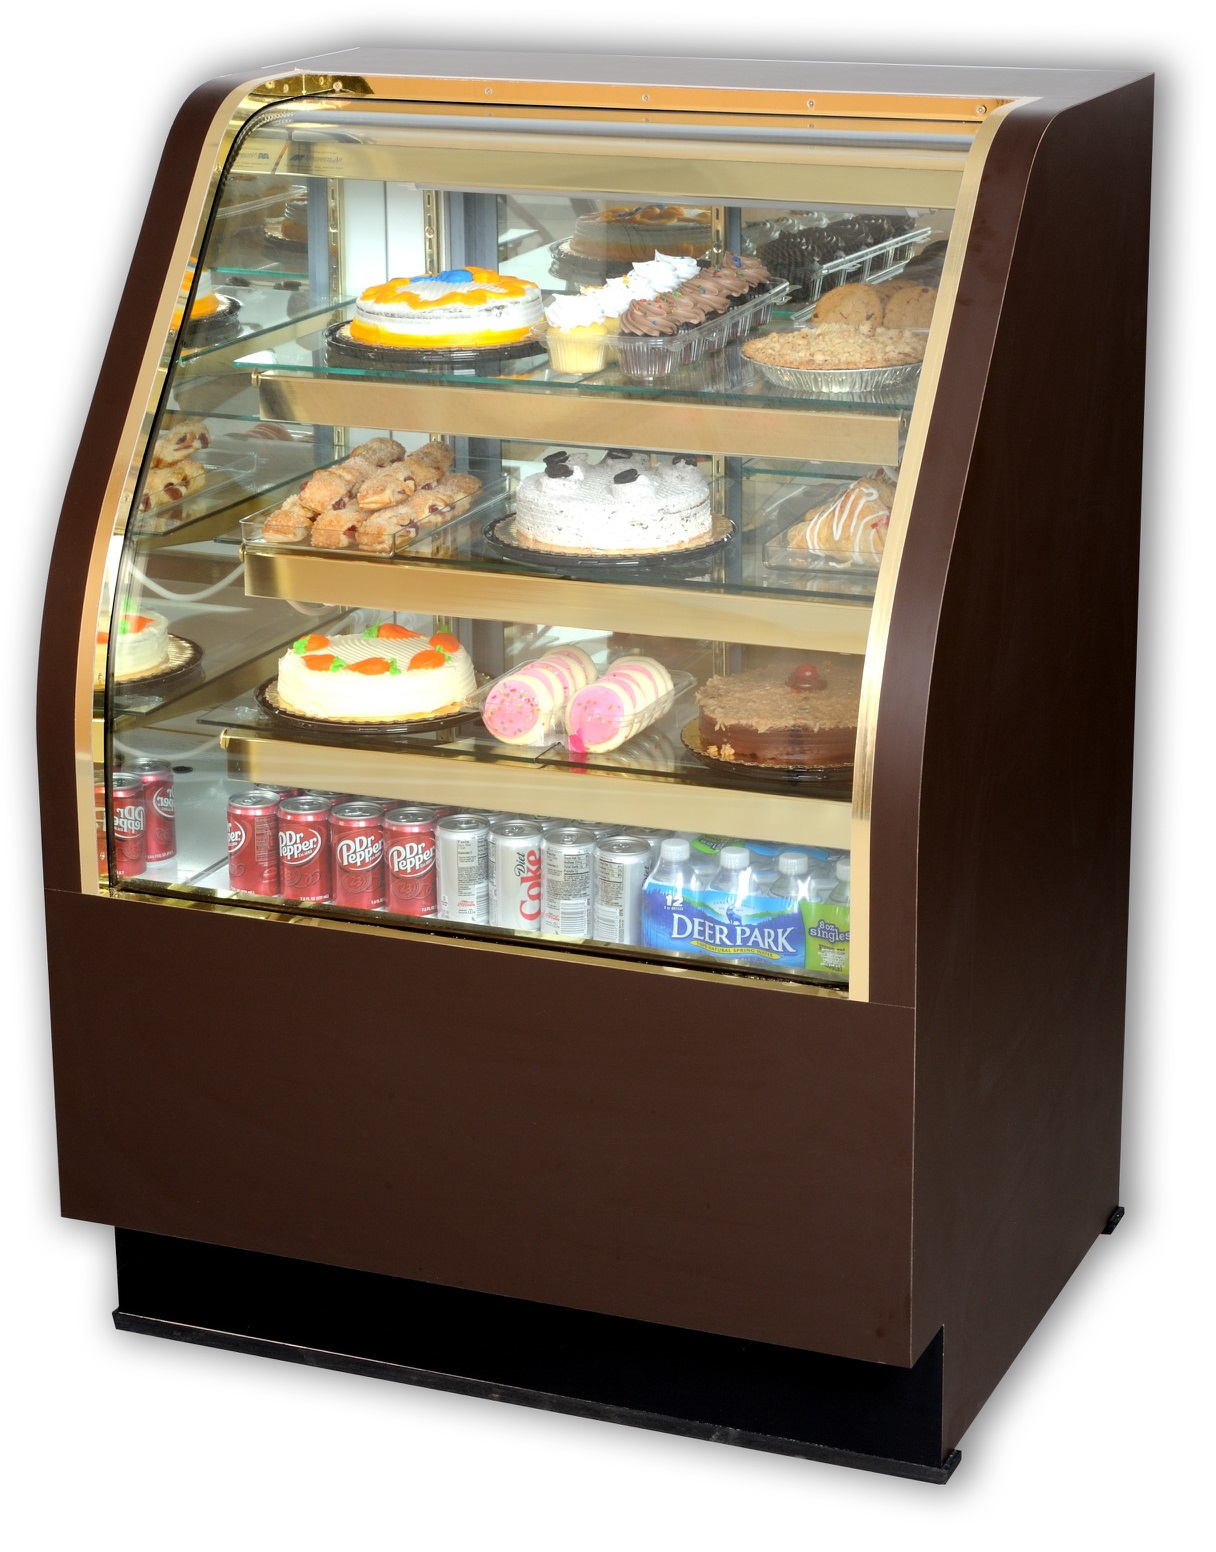 bakery-display-case-double-bend.jpg